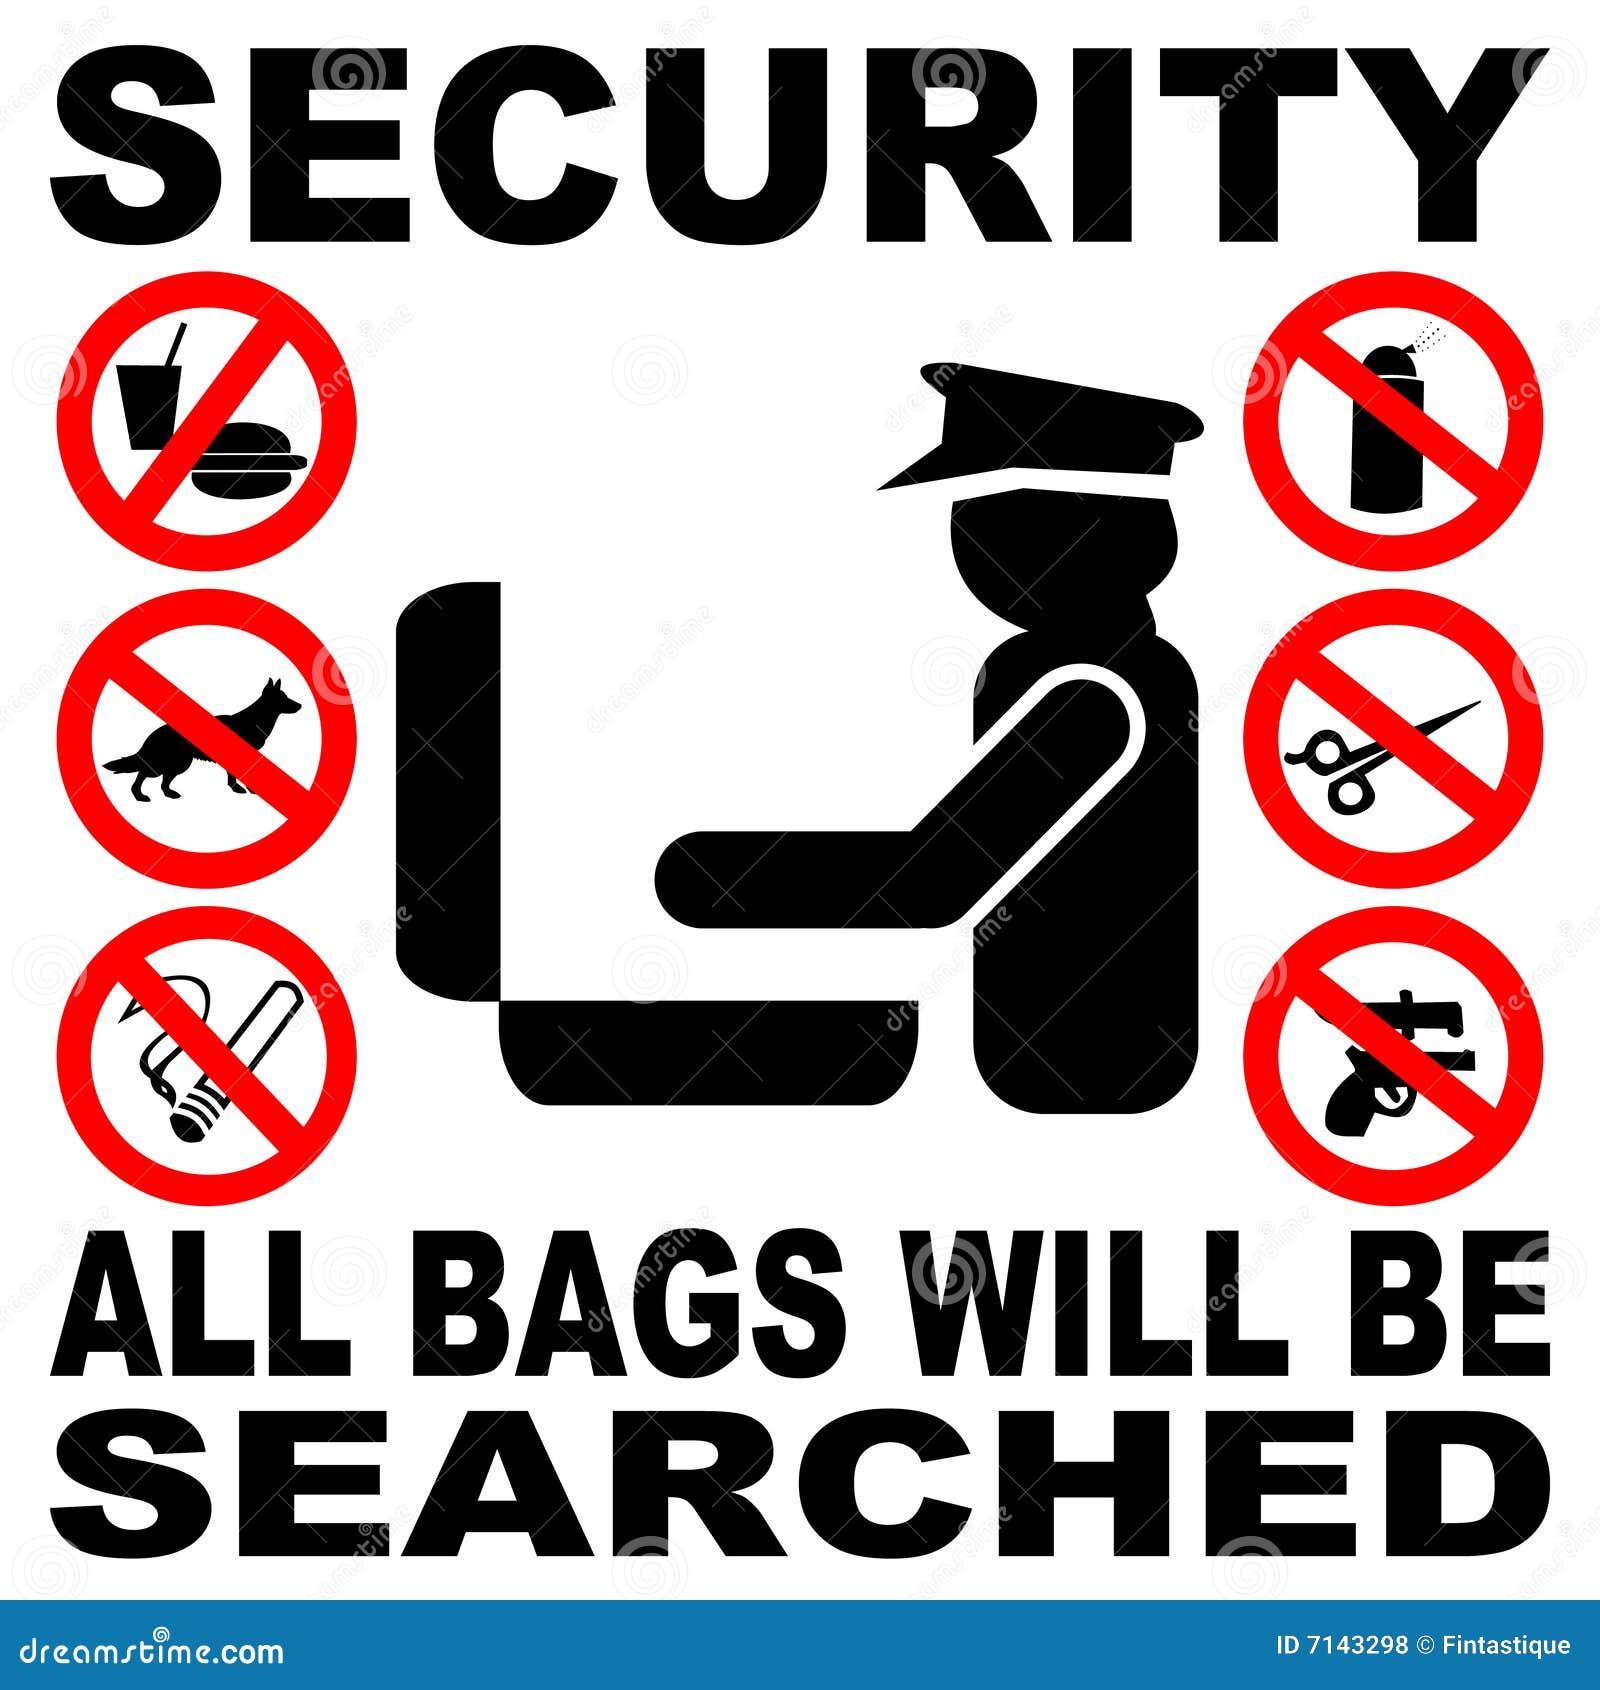 Employer Bag Searches | Chron.com